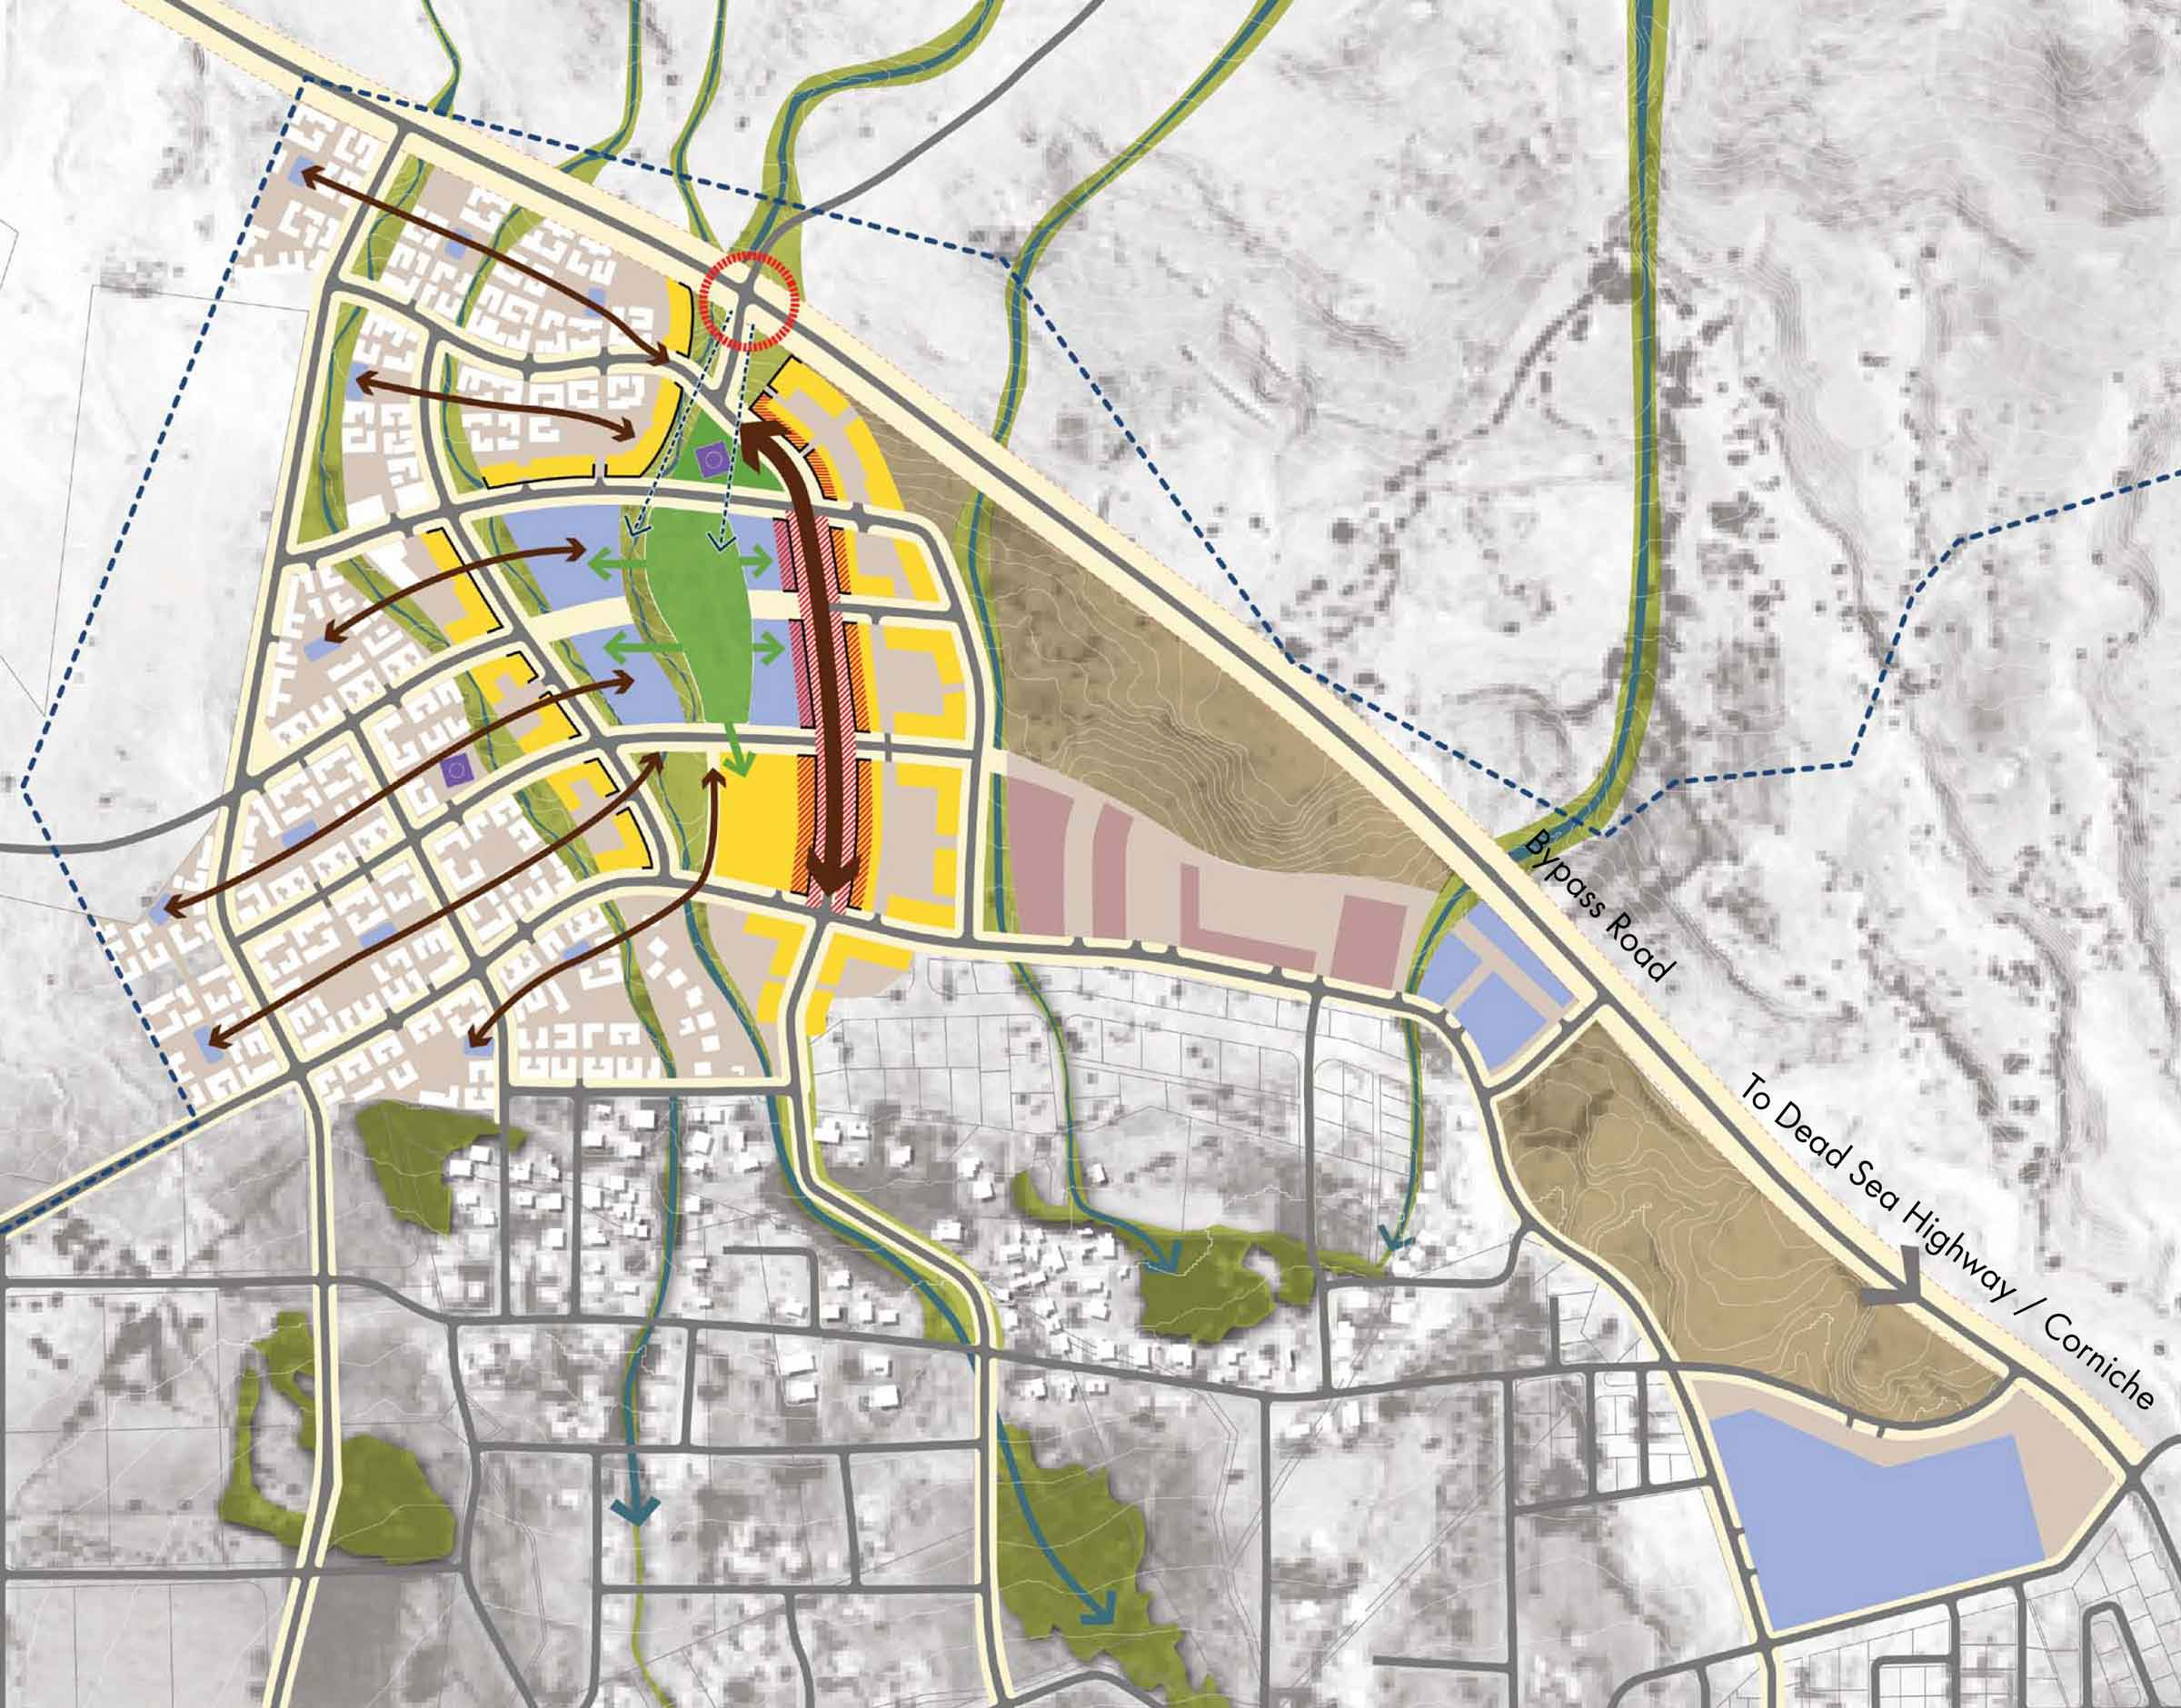 Detail from Sweimeh Urban District concept plan. Image courtesy Sasaki Associates.